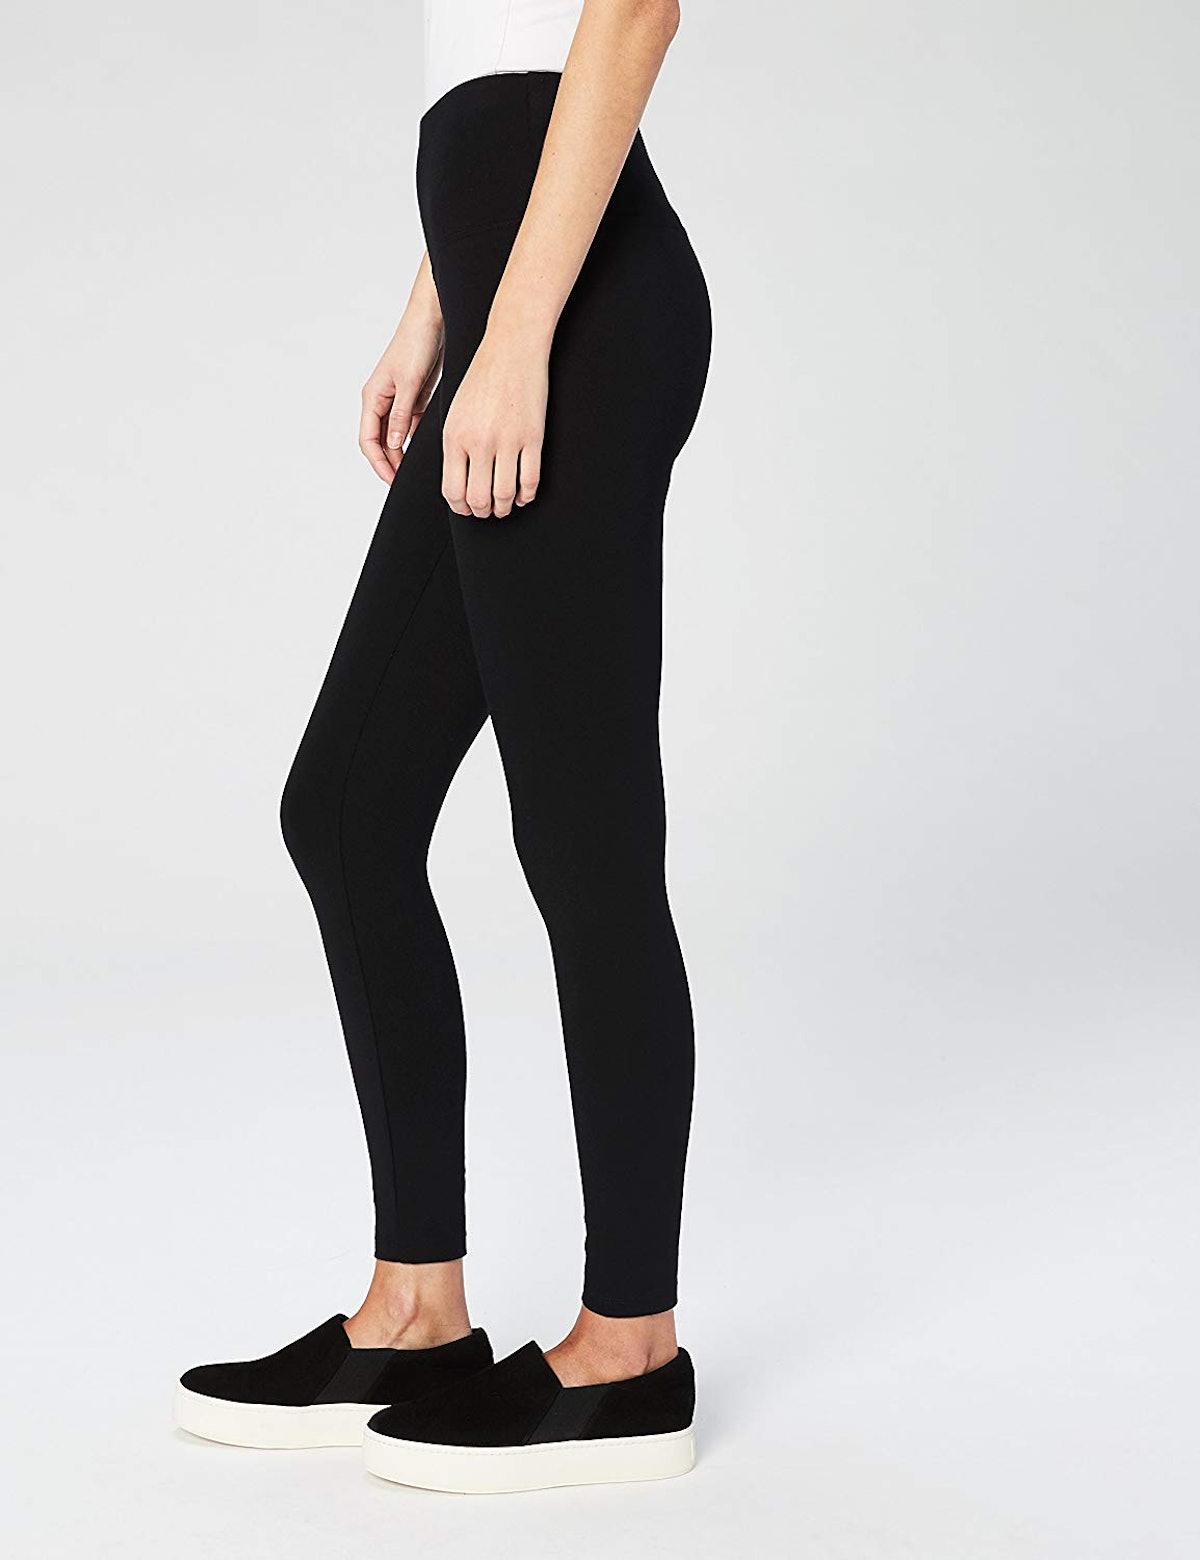 Daily Ritual Women's High Waist Stretch Legging